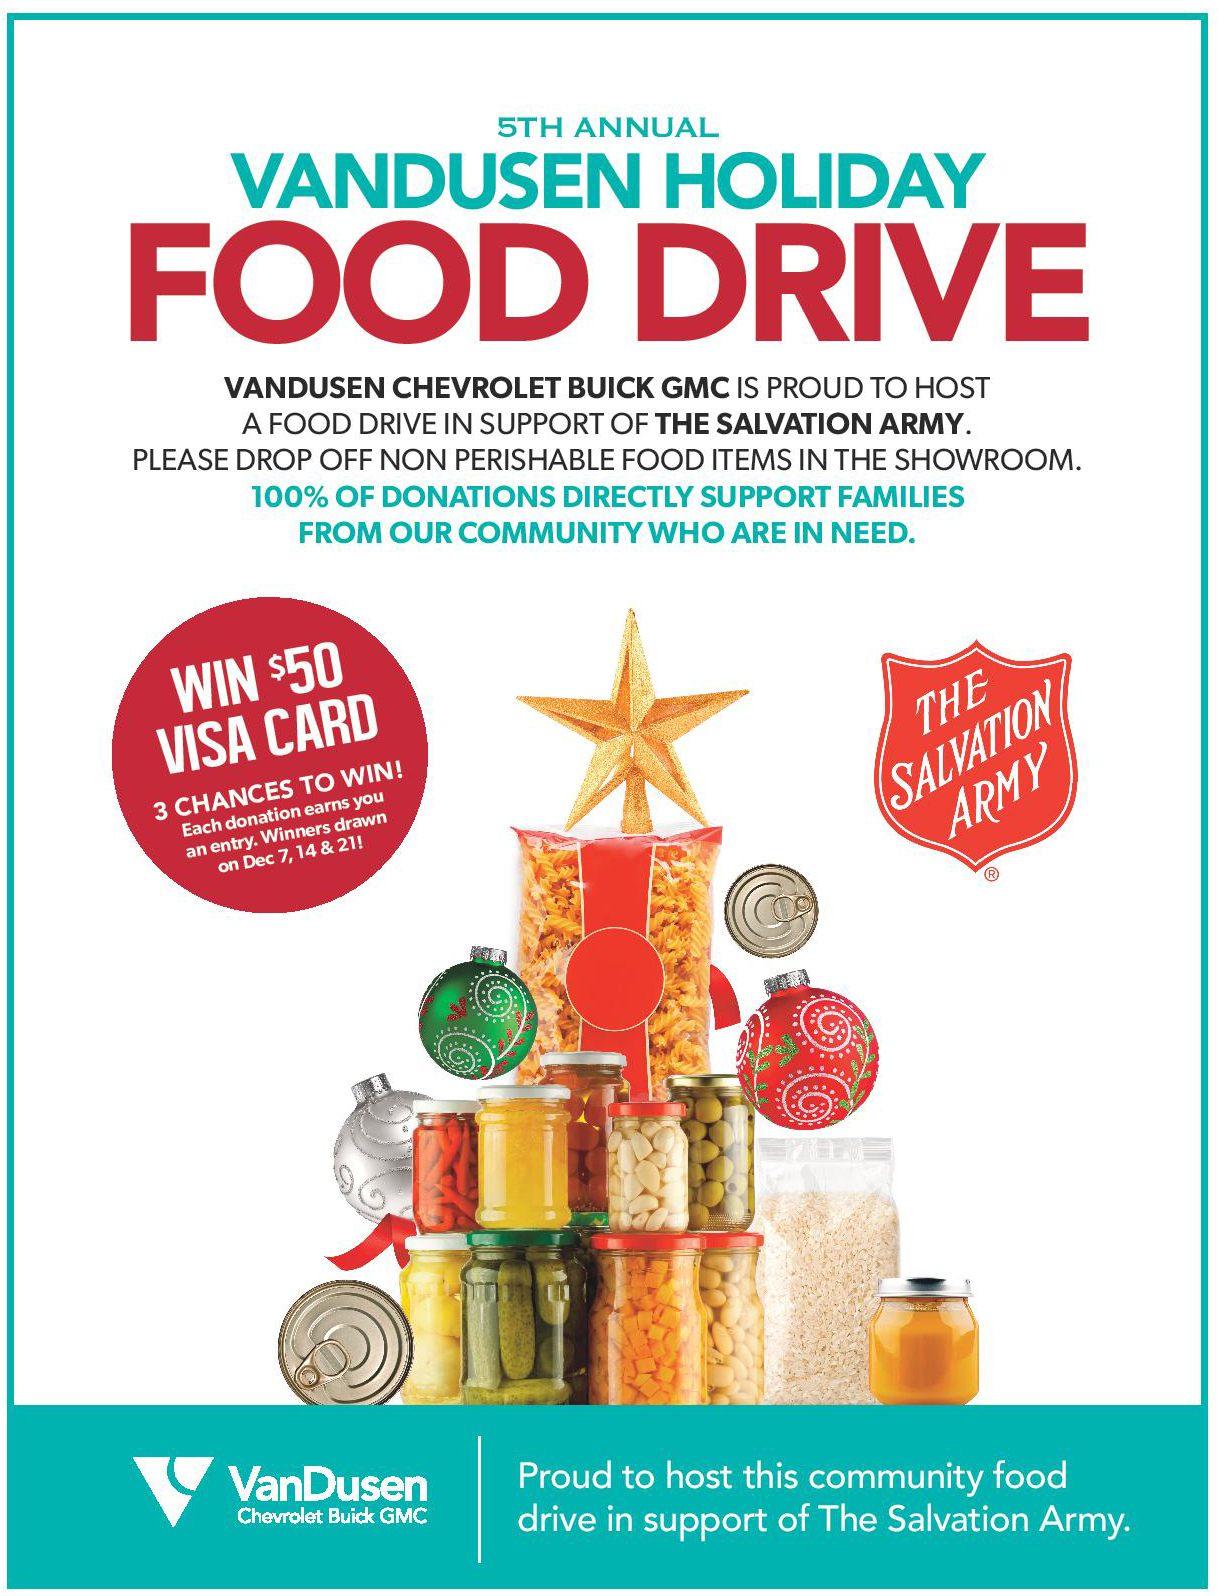 VanDusen Holiday Food Drive 2018 Ajax Ontario